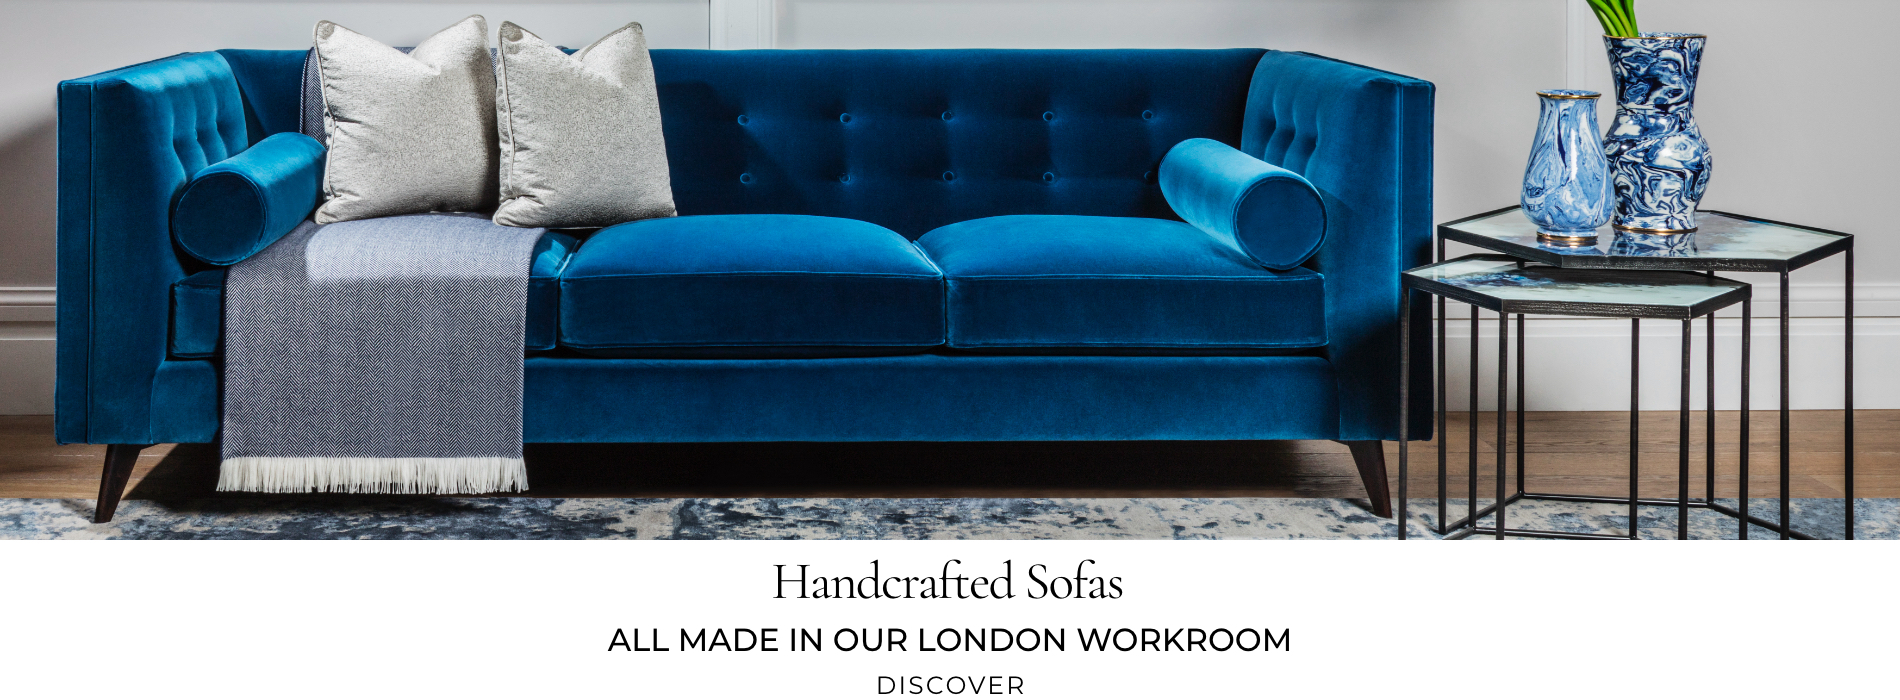 Explore handcrafted sofas